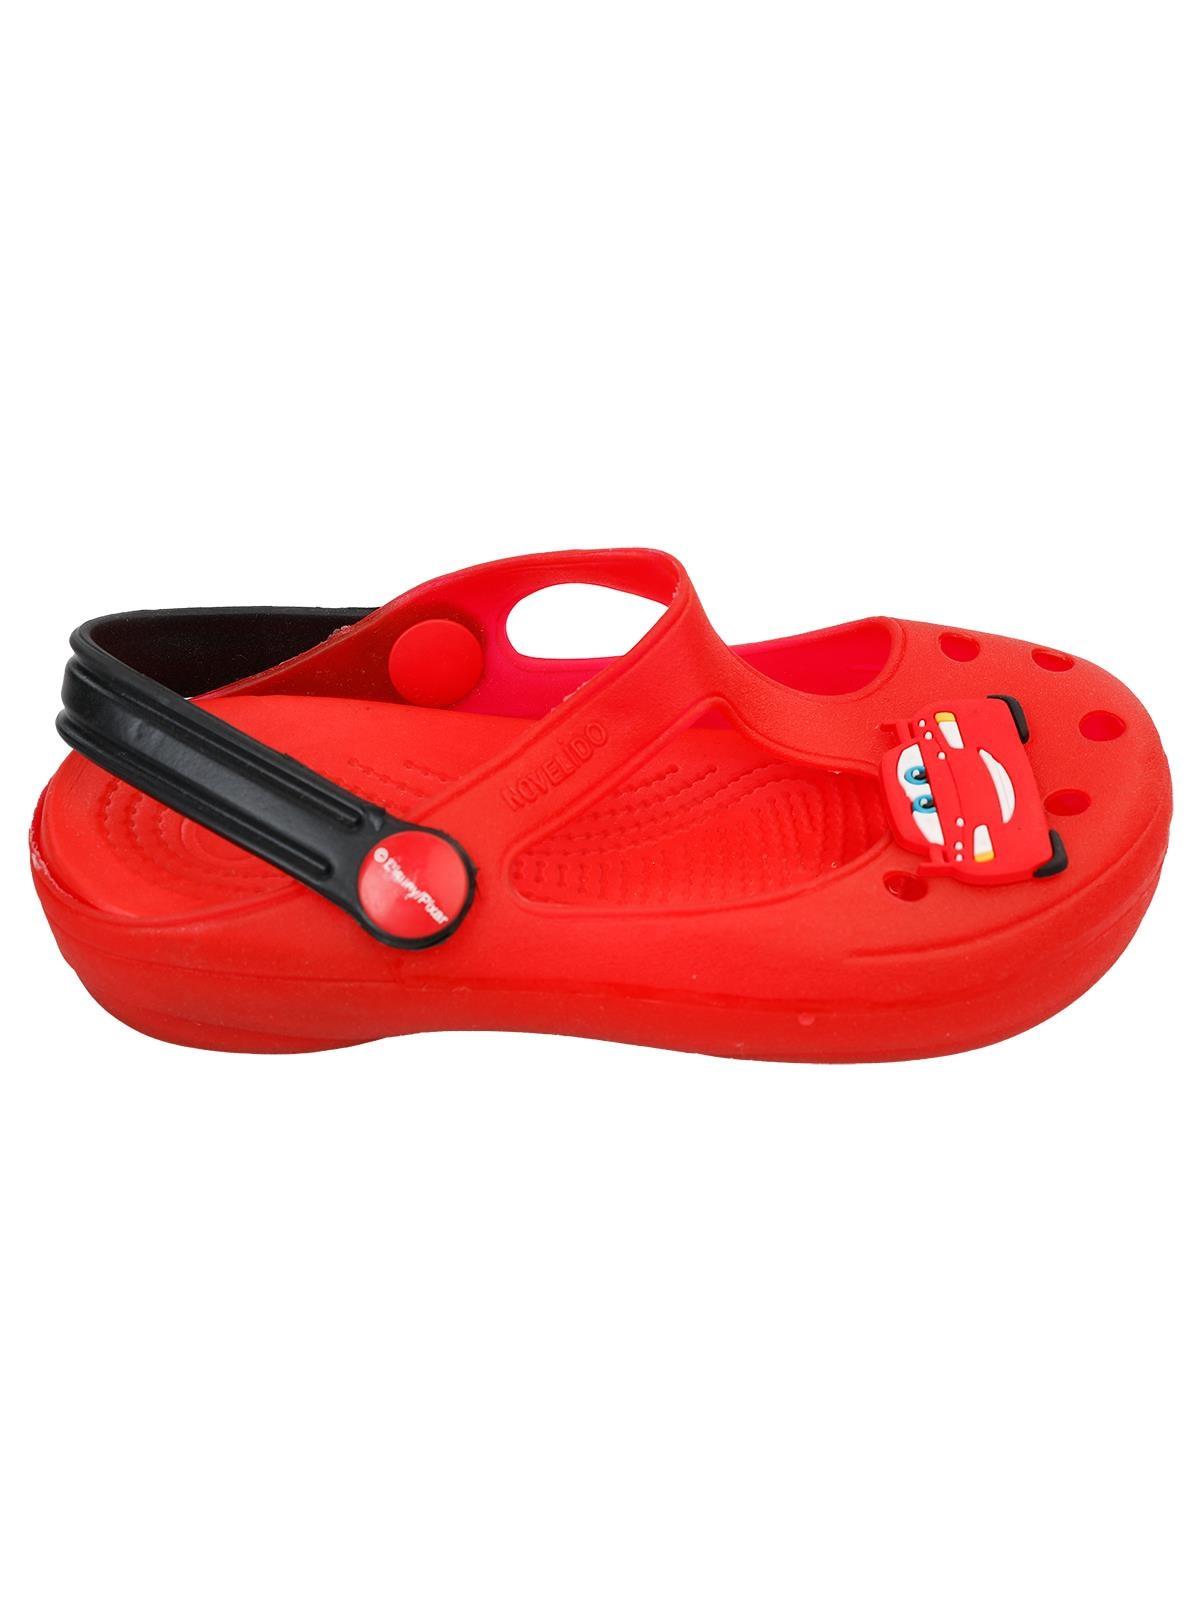 2020 summer boys girls slippers home outdoors beach pool Sandals soft non-slip bath slippers Kids Slippers 23-29 size